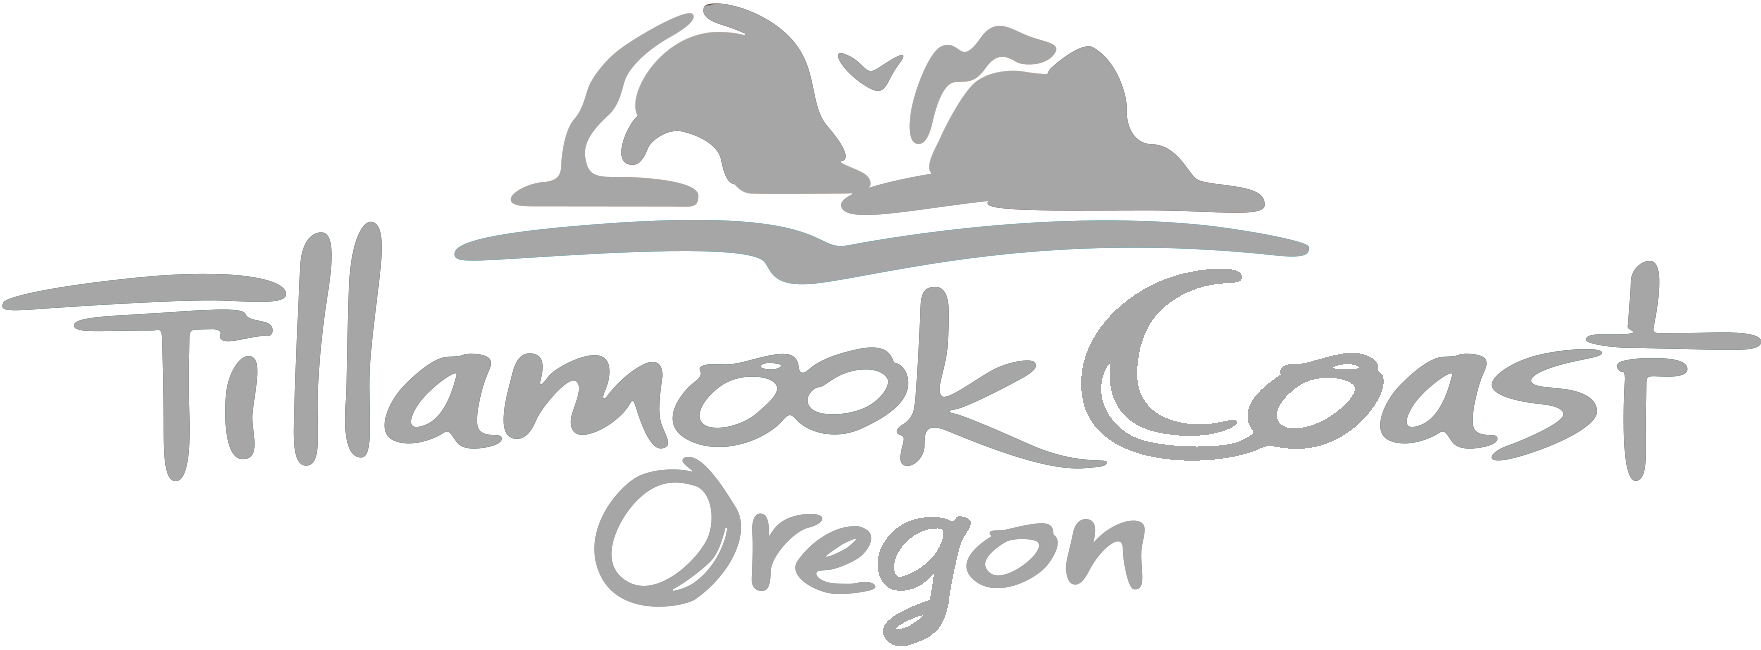 Oregon-Brandmark-6colorgray copy.png